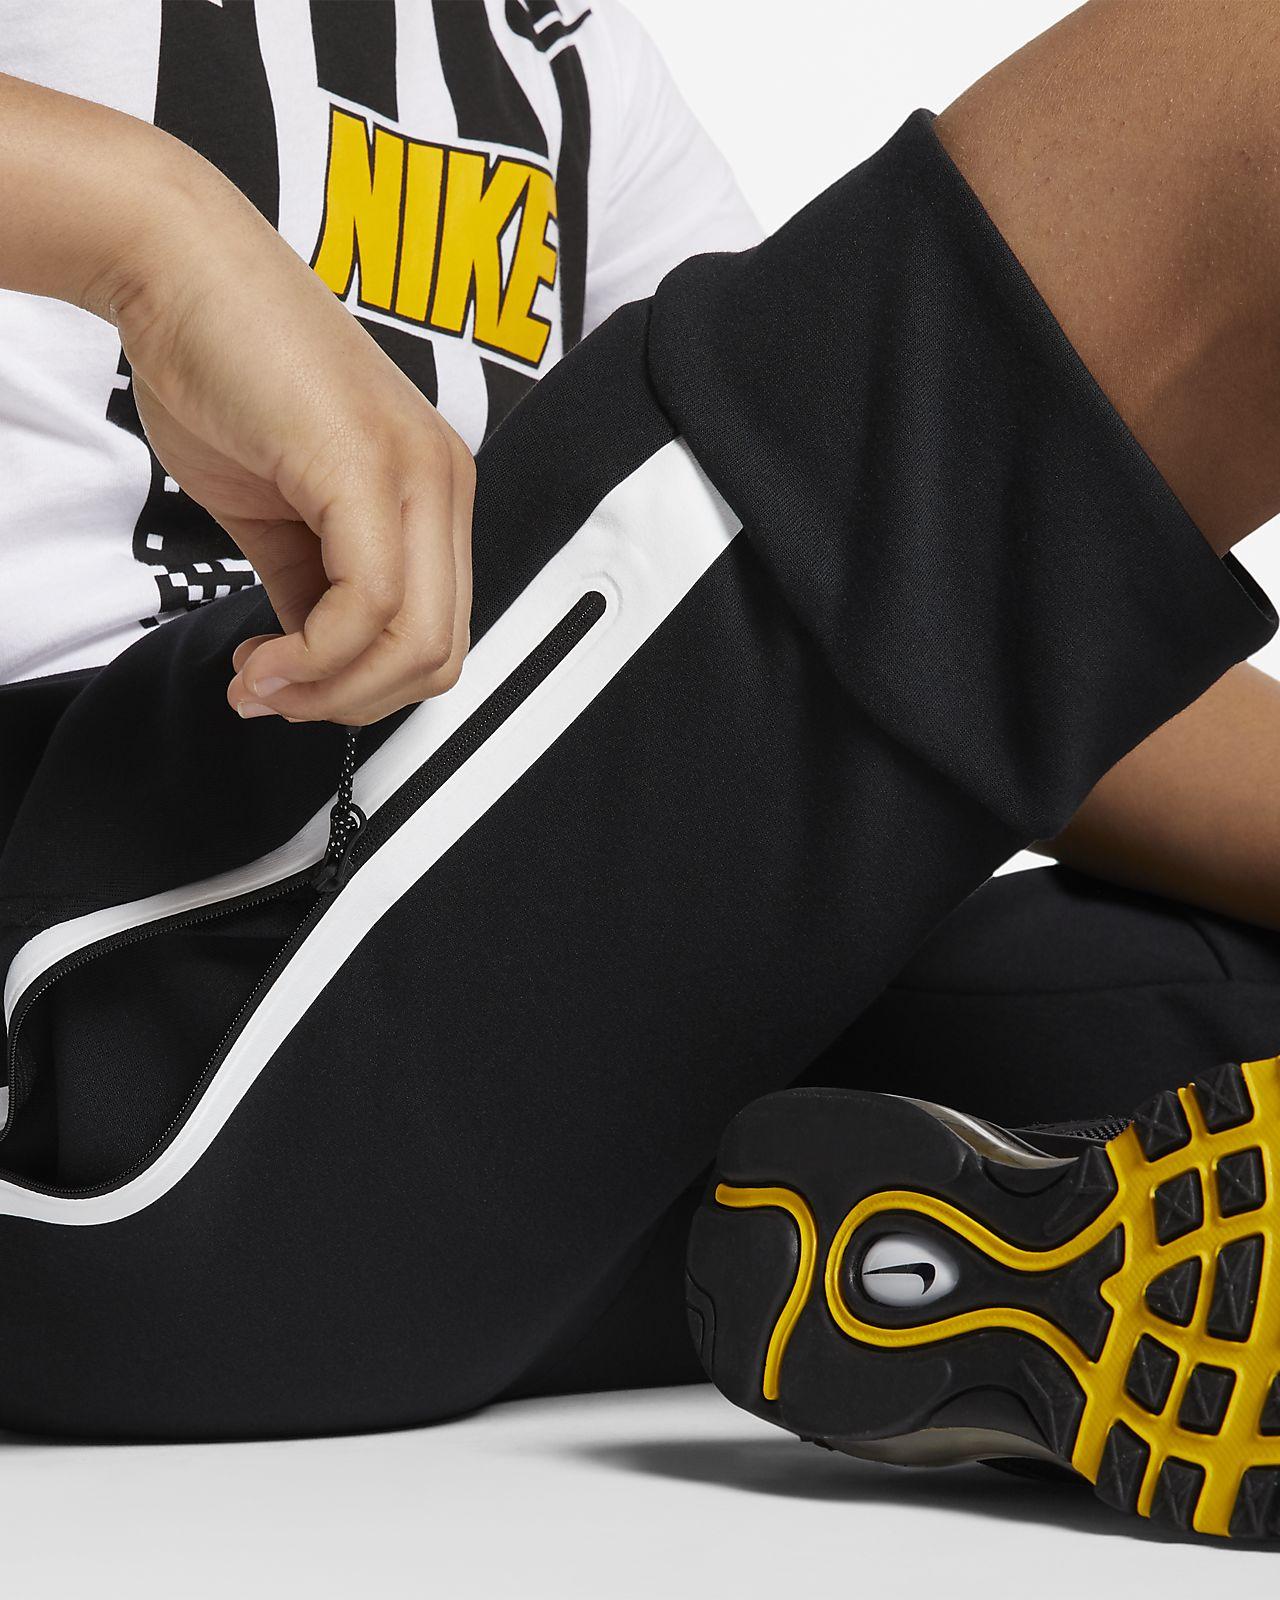 Nike Dry Fit Kids Boy's Track Pants Black Size 5 NWT